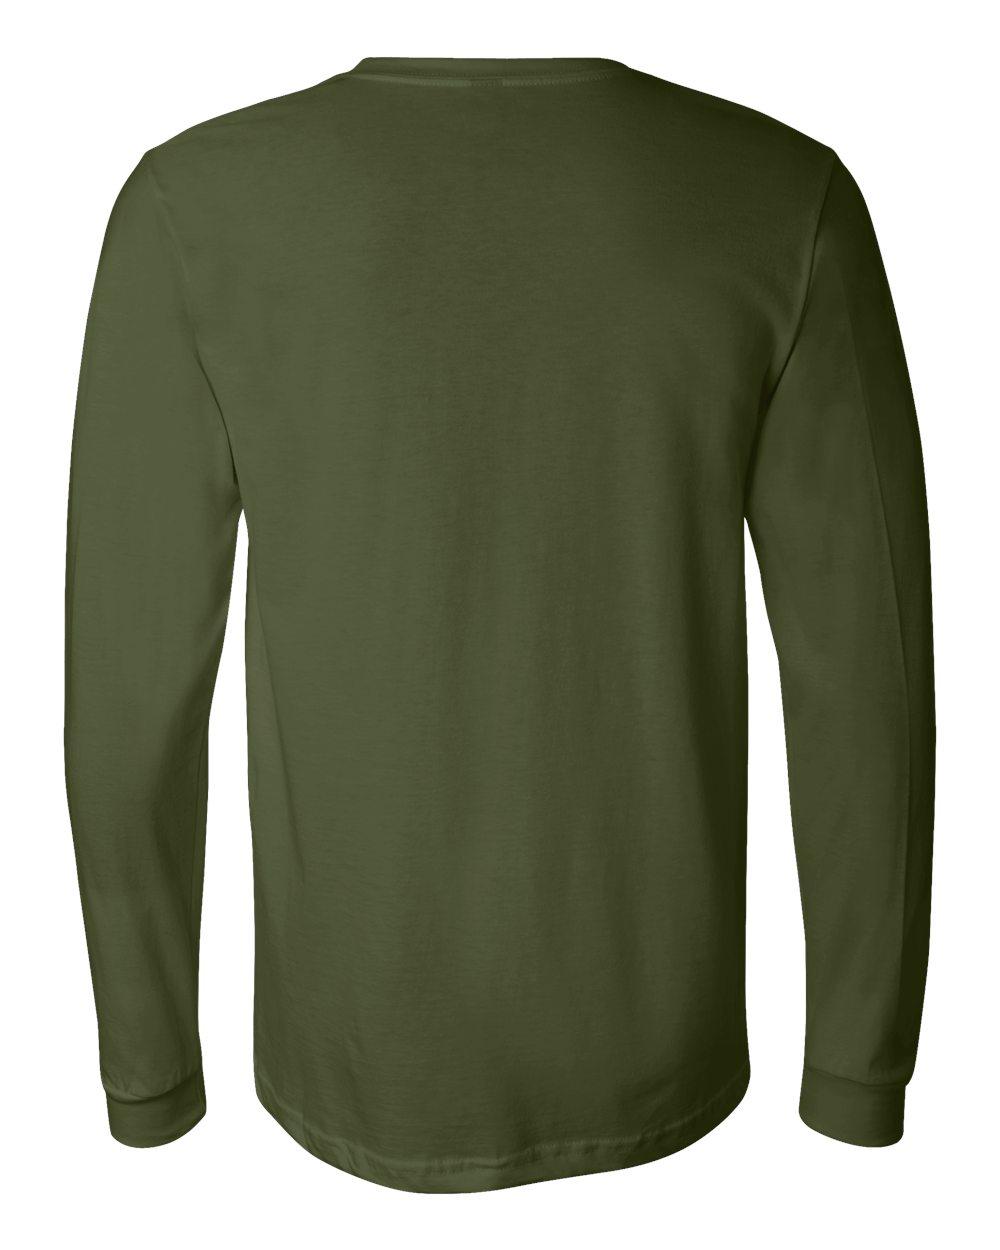 Bella-Canvas-Mens-Blank-Top-Long-Sleeve-Jersey-Tee-T-Shirt-3501-up-to-3XL thumbnail 95